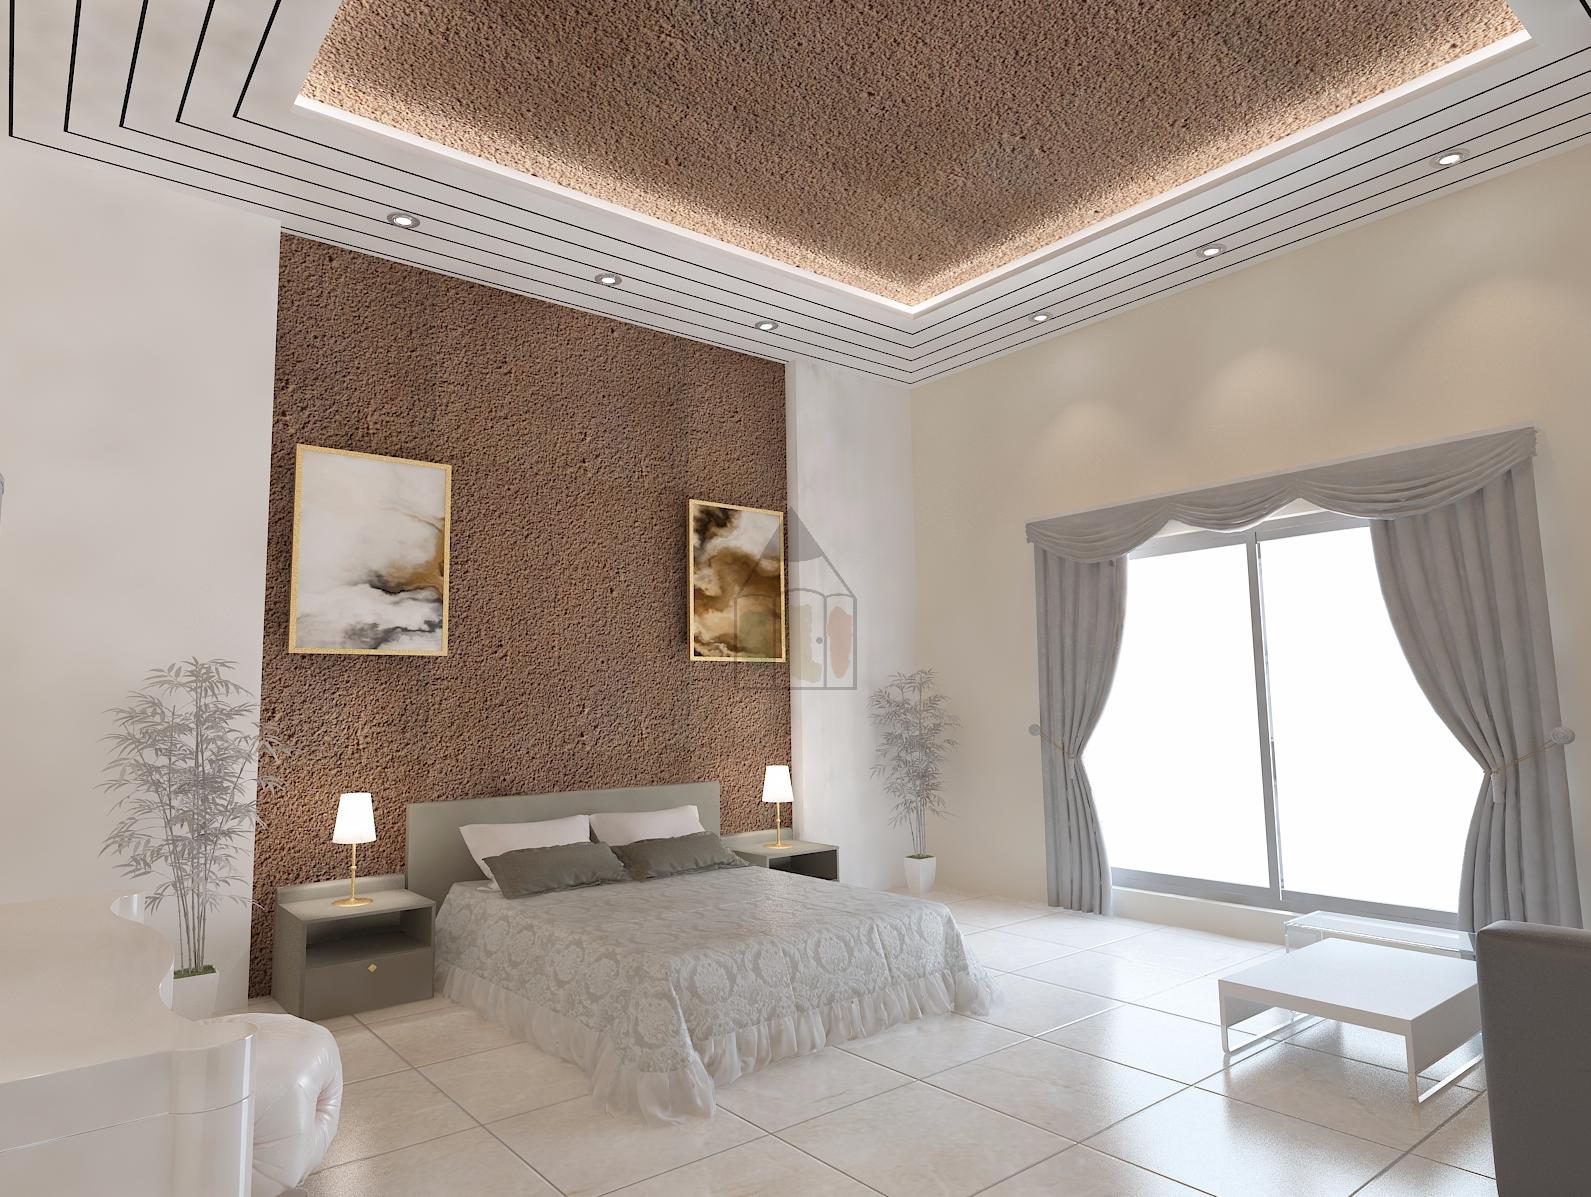 27 best Bedrooms Interior Design & Room decor images on Pinterest ...